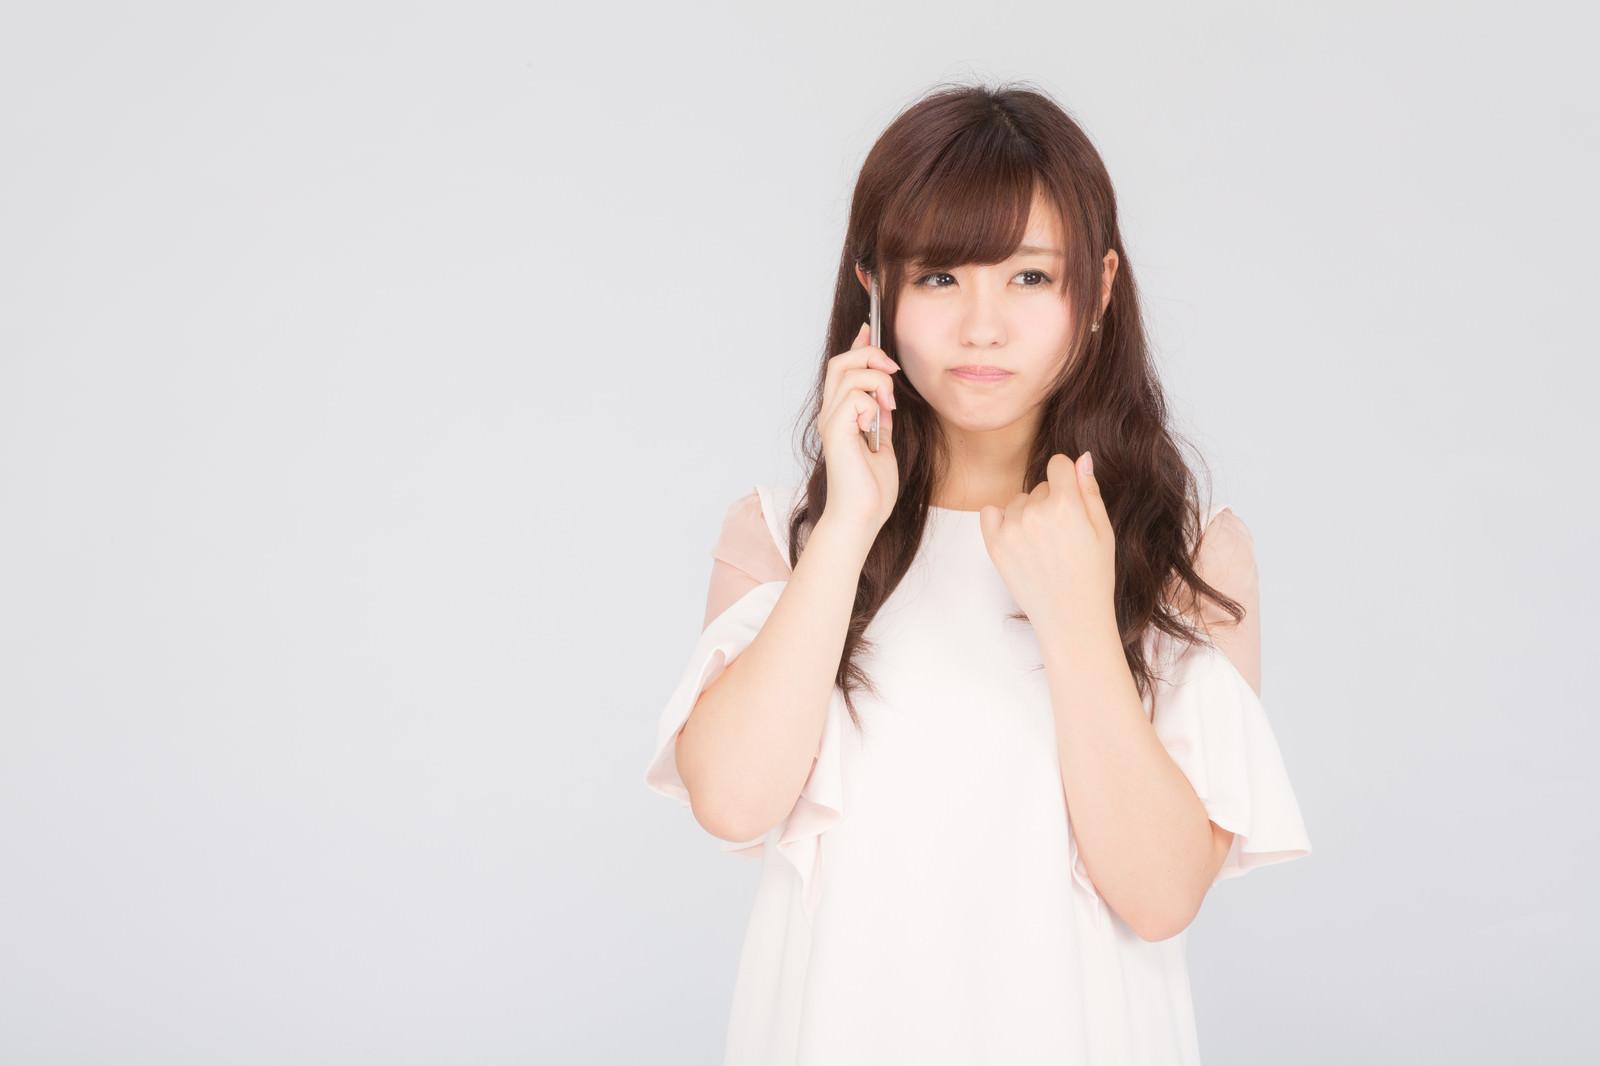 https://www.pakutaso.com/shared/img/thumb/kawamura20160818403614_TP_V.jpg